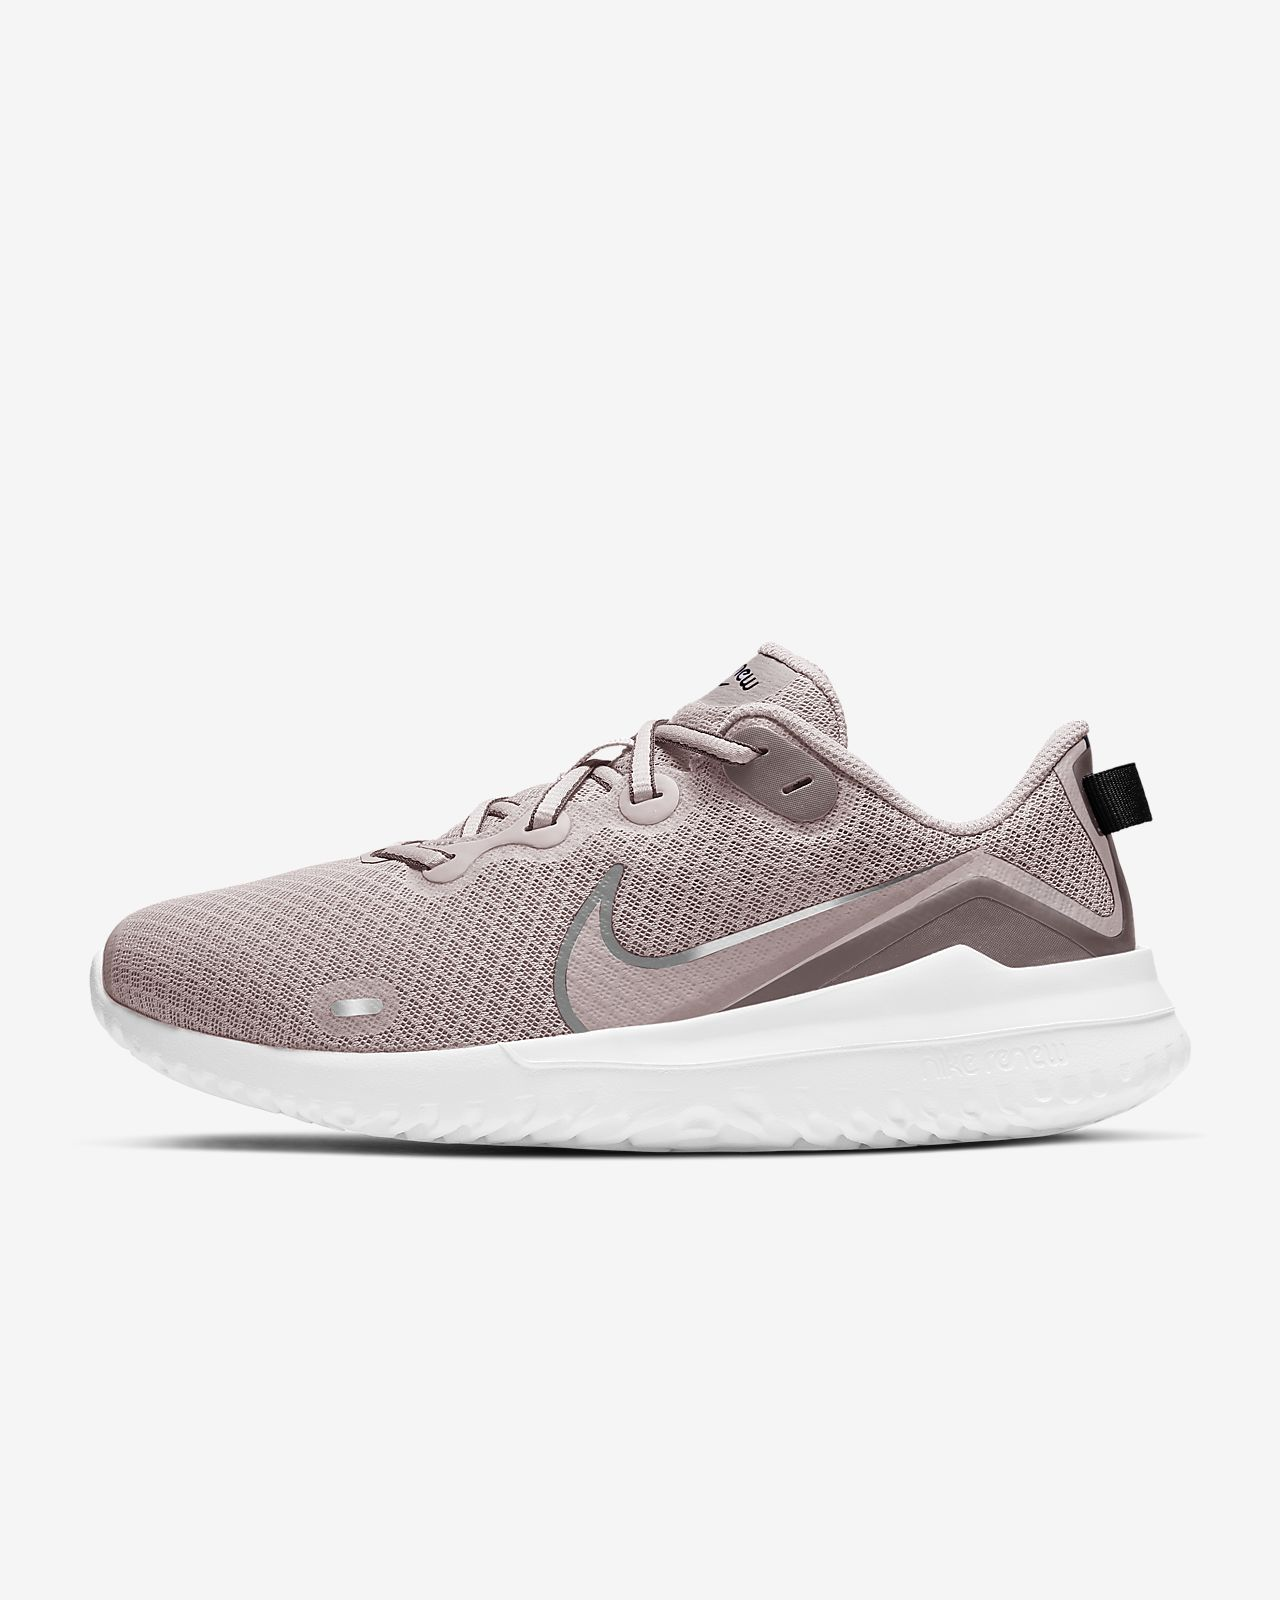 Calzado de running para mujer Nike Renew Ride